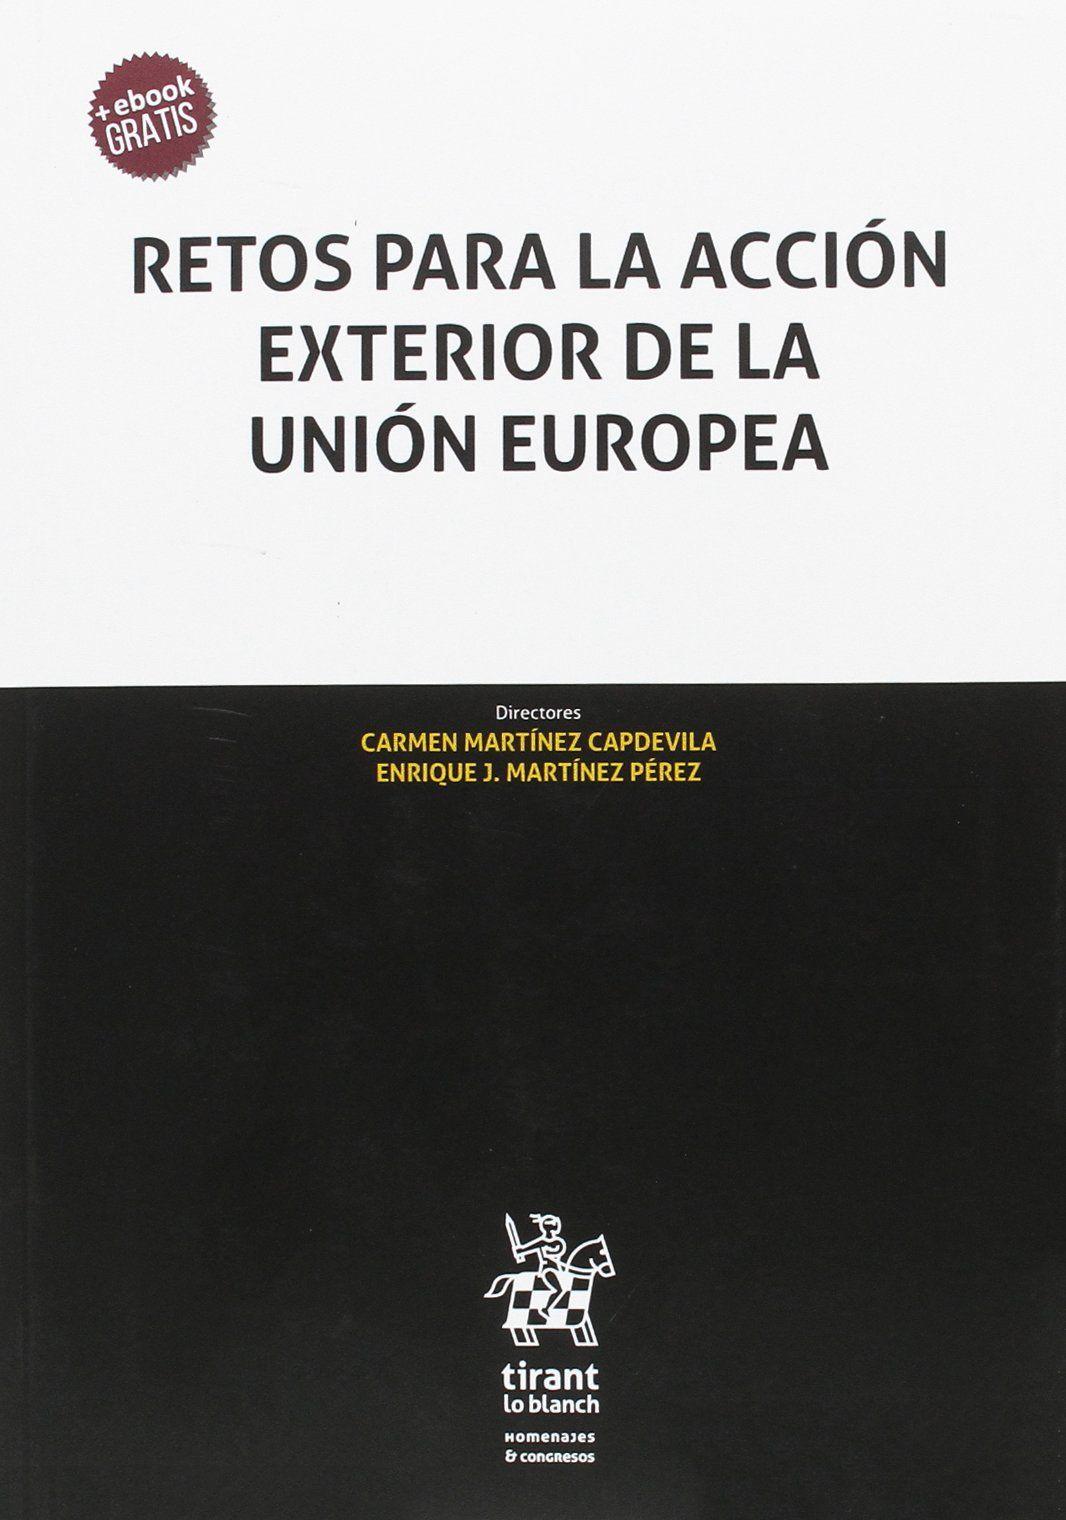 Retos Para La Accion Exterior De La Union Europea Carmen Martinez Capdevila Enrique J Martinez Perez Directores Tirant Lo Blanch 2017